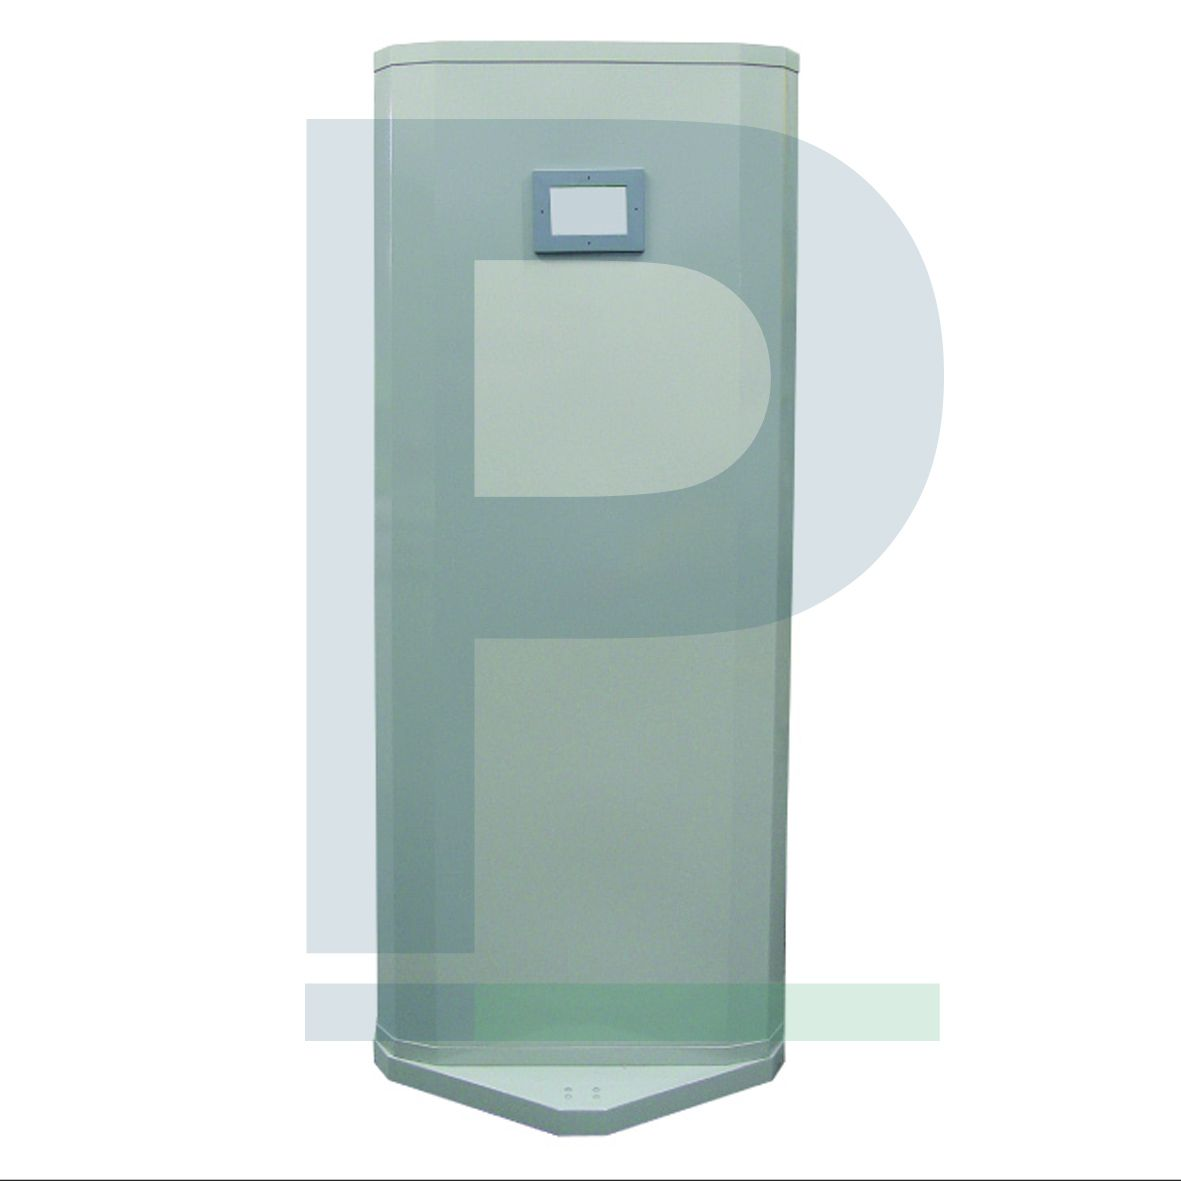 Biombo Curvo com Proteção de Chumbo e Visor Plumbífero 1,90x80 Cm